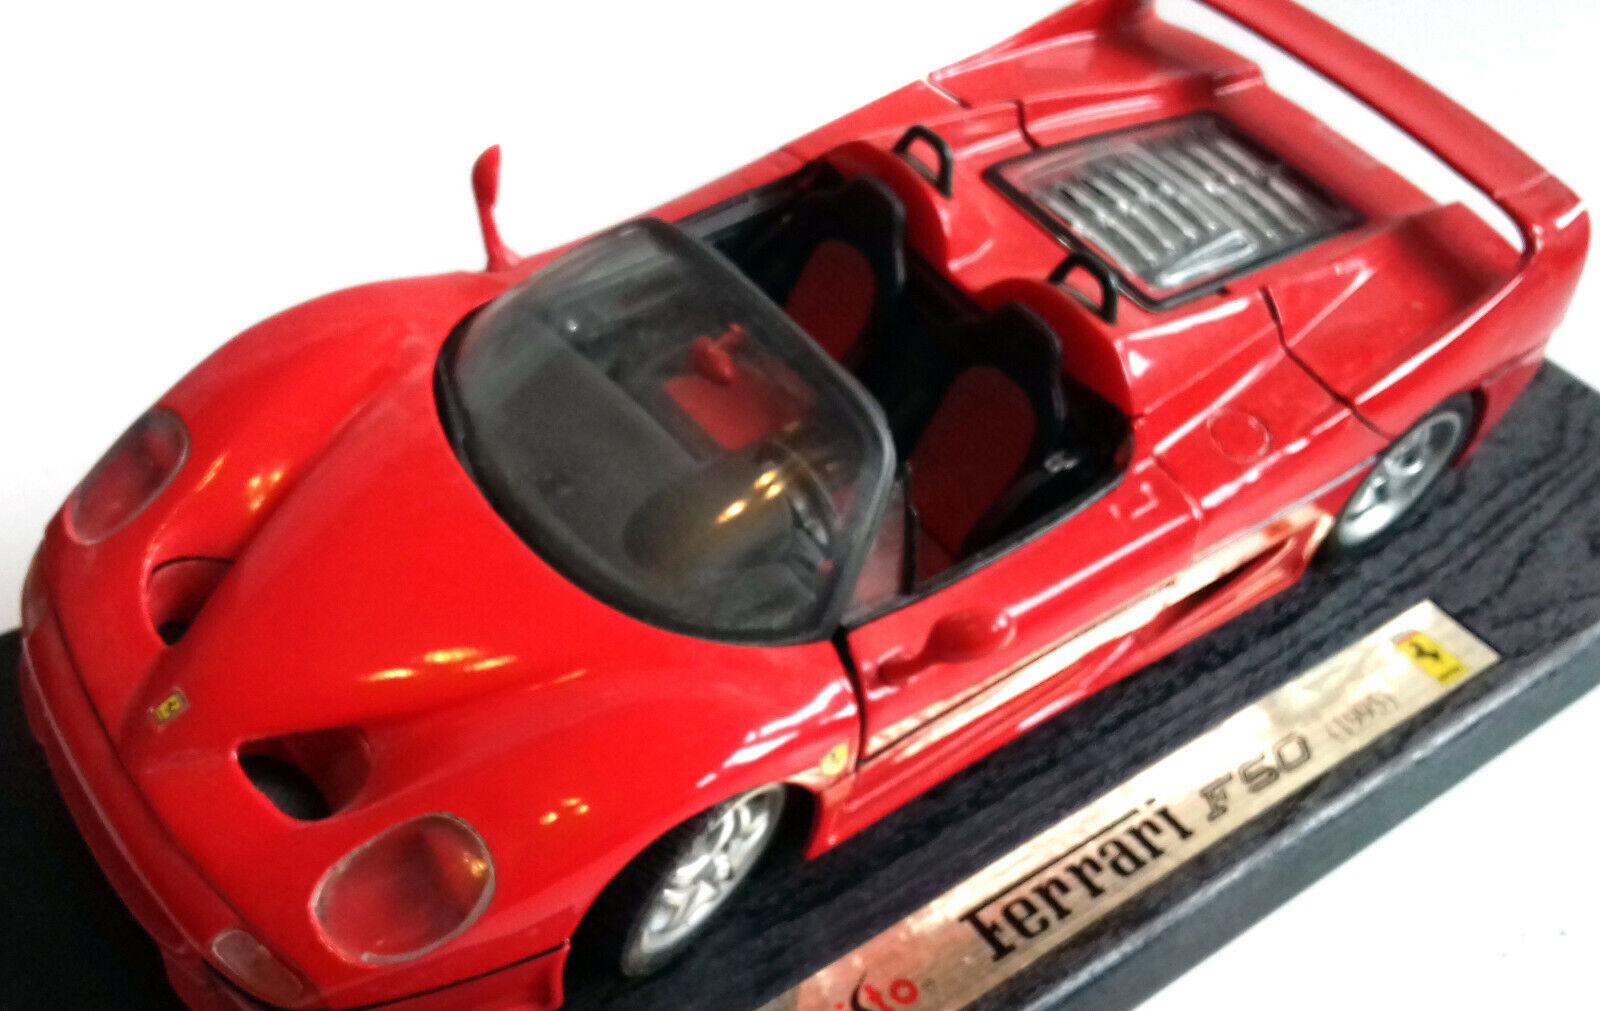 Maisto Toys 1 18 Scale Die cast Metal Metal Metal Ferrari F50 1999 Model Car red, FAST NEED c10239